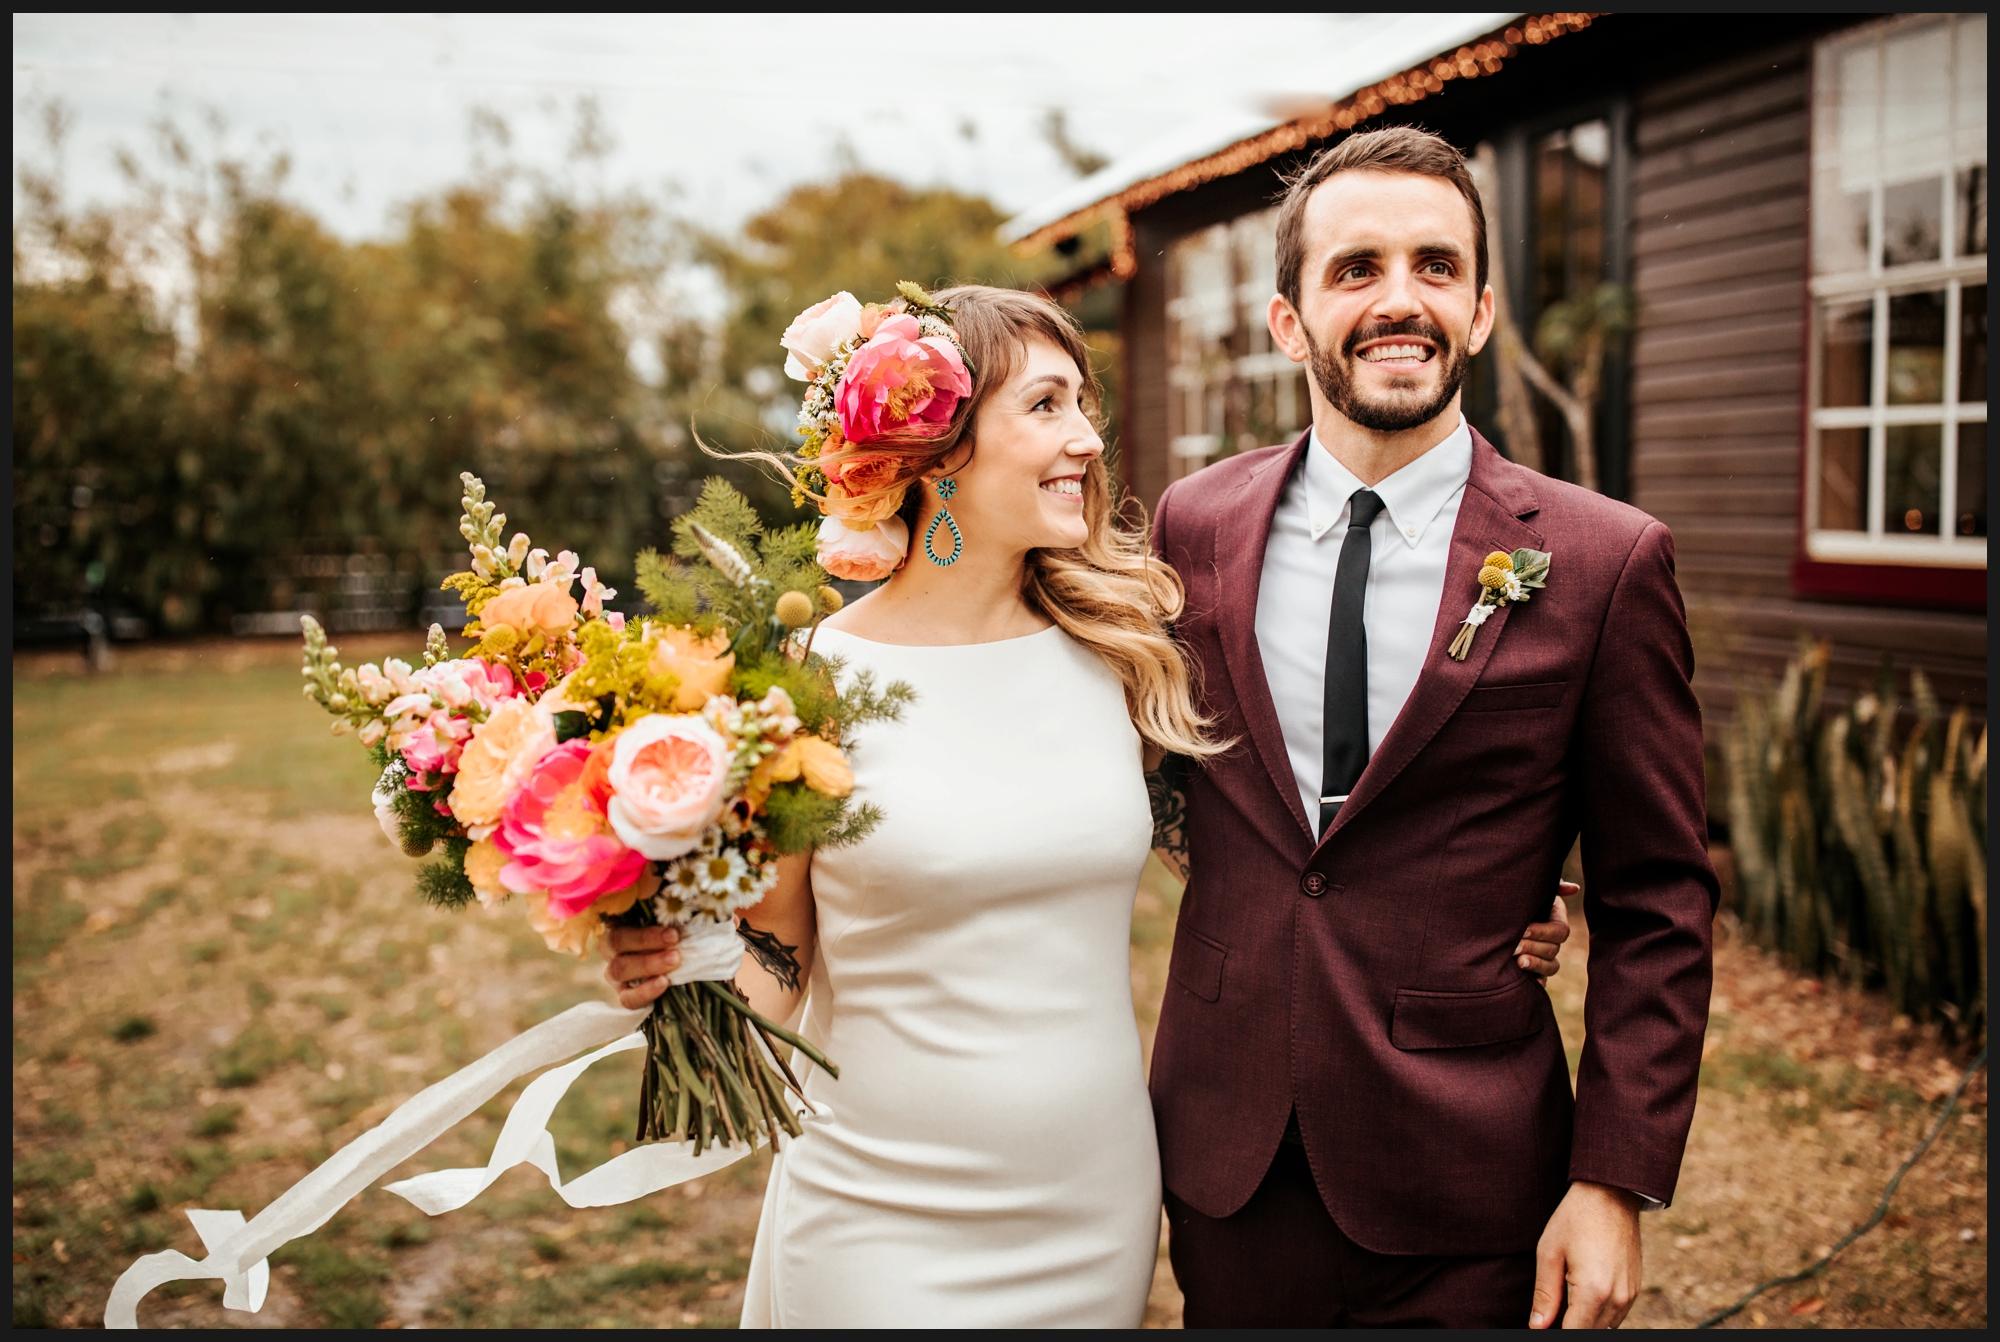 Orlando-Wedding-Photographer-destination-wedding-photographer-florida-wedding-photographer-bohemian-wedding-photographer_2021.jpg